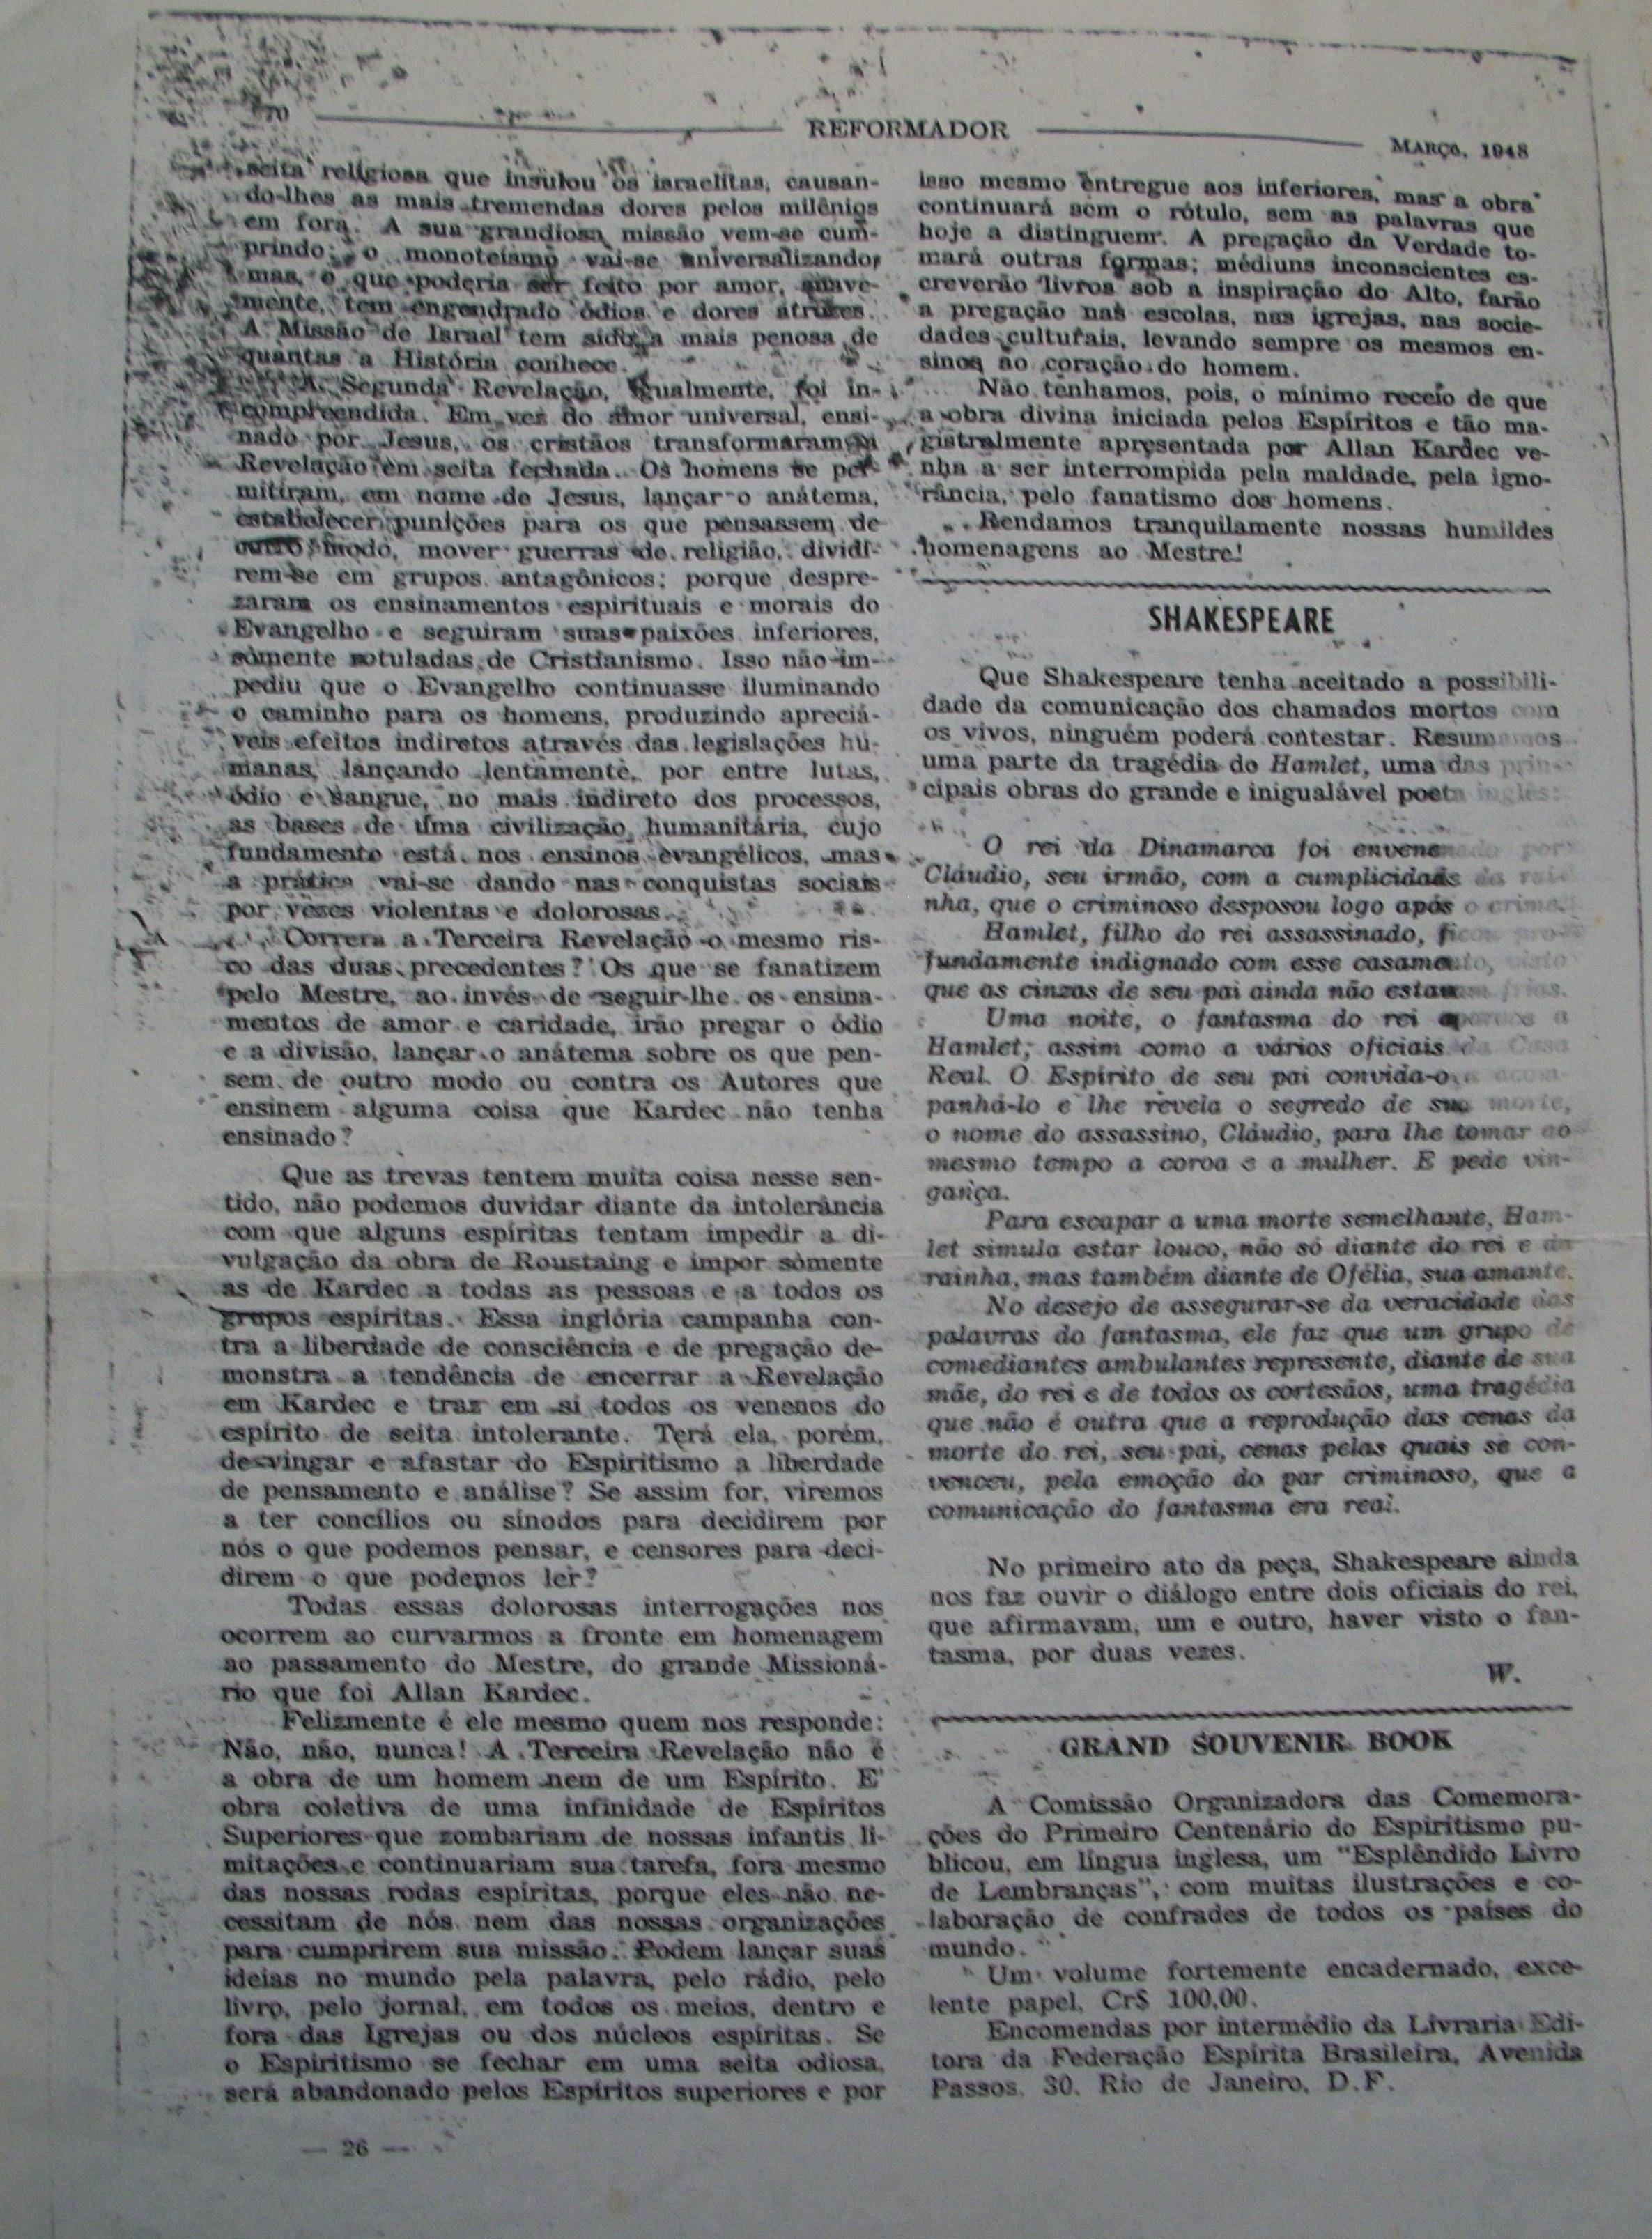 O REFORMADOR - MARÇO 1948 - ISMAEL GOMES BRAGA-2